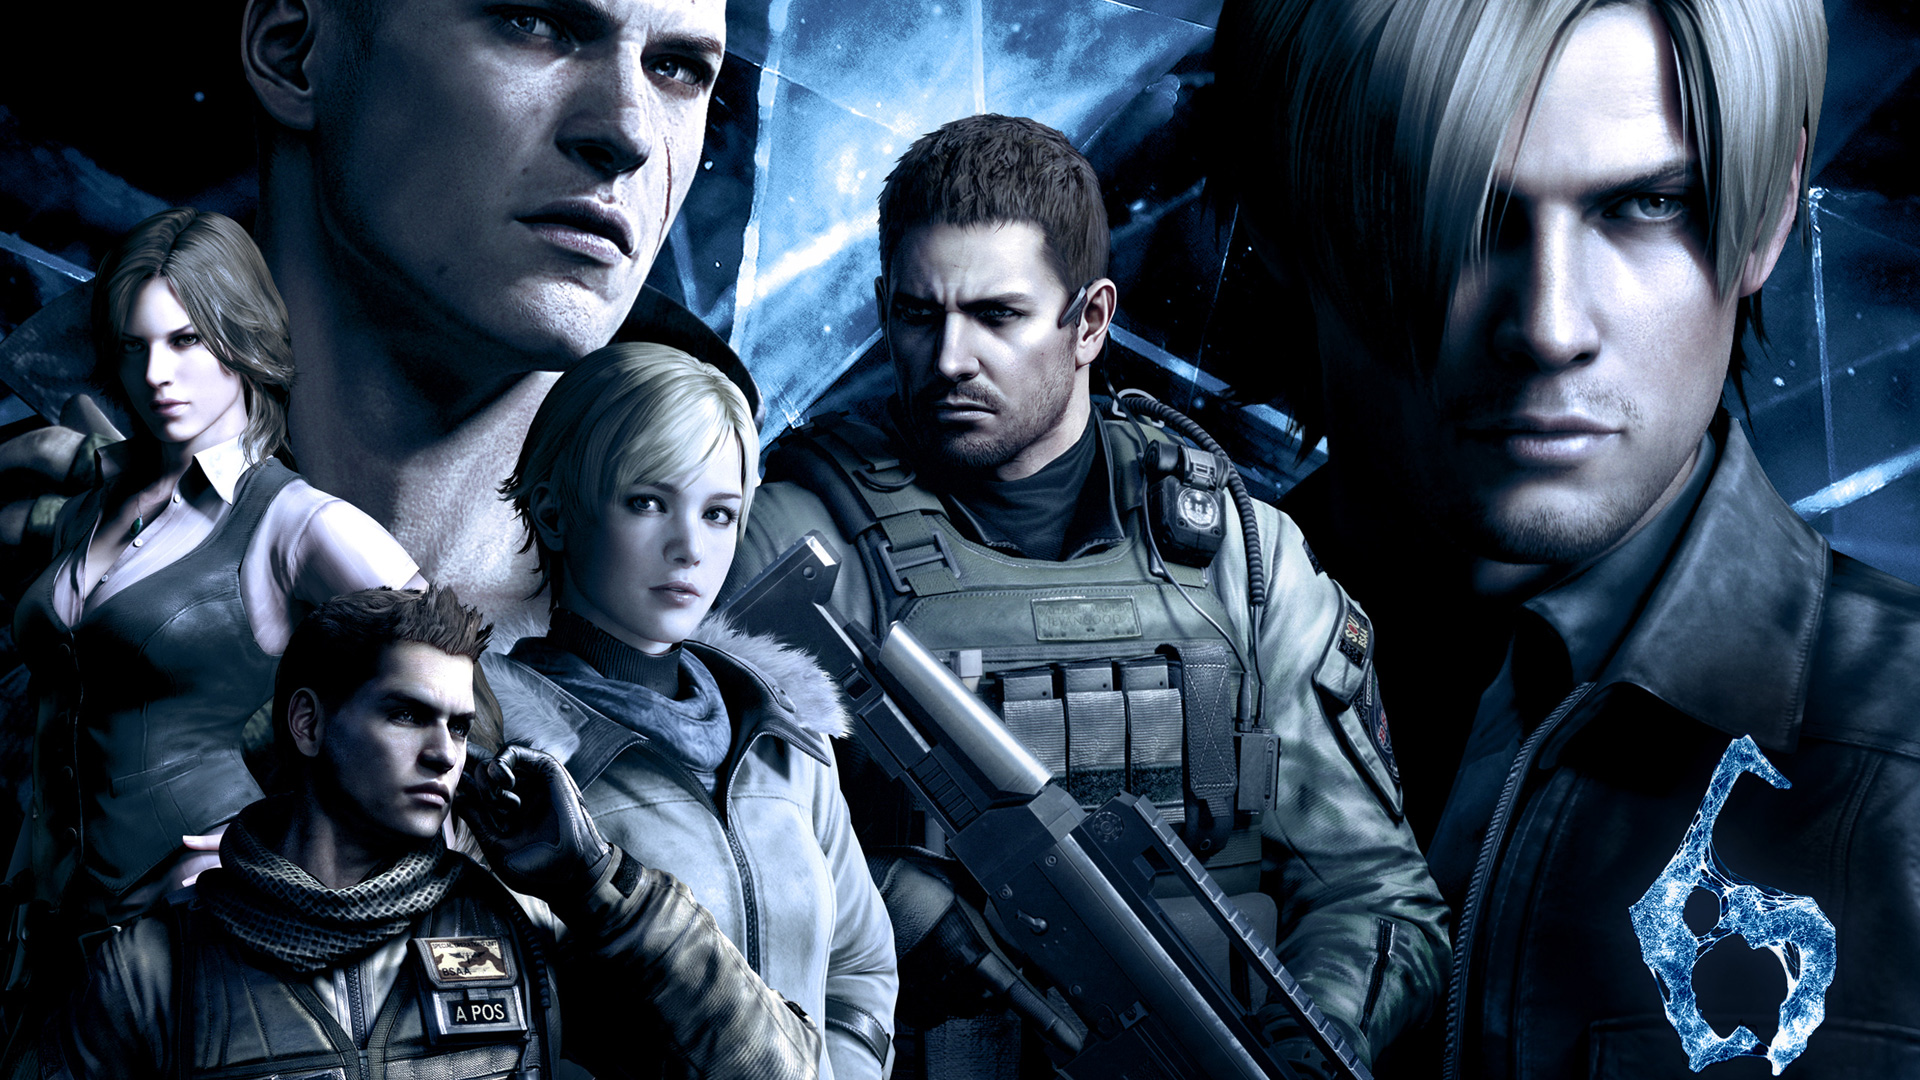 Add Media Report RSS Resident Evil 6 Wallpaper View Original